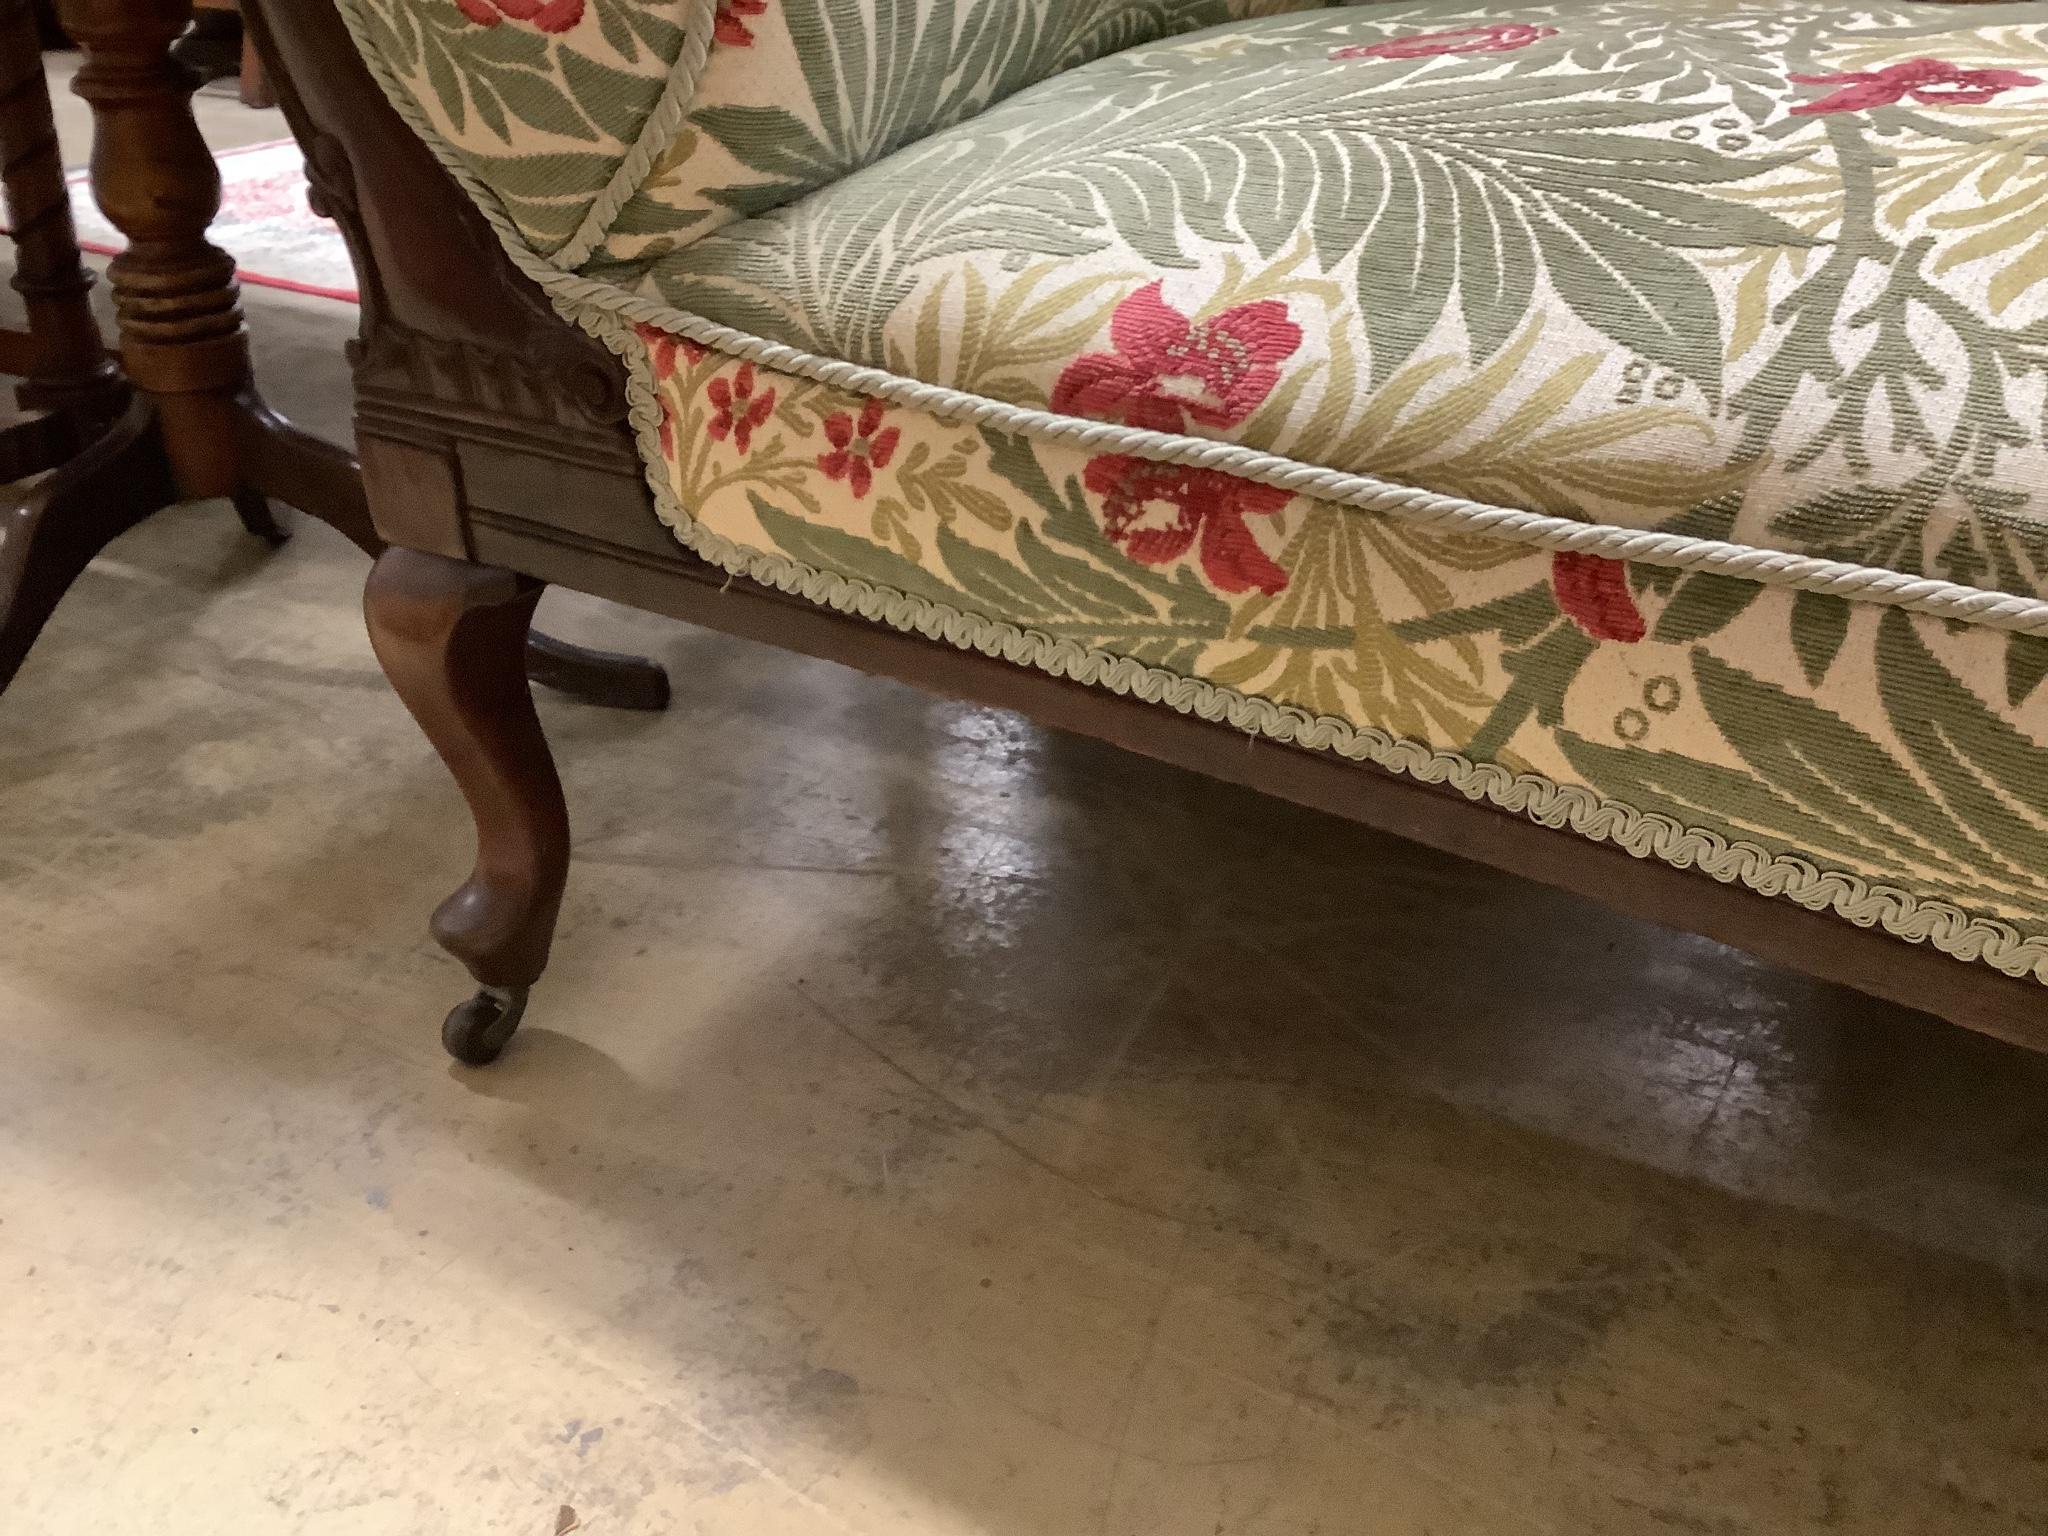 A Victorian mahogany chaise longue - Image 3 of 3